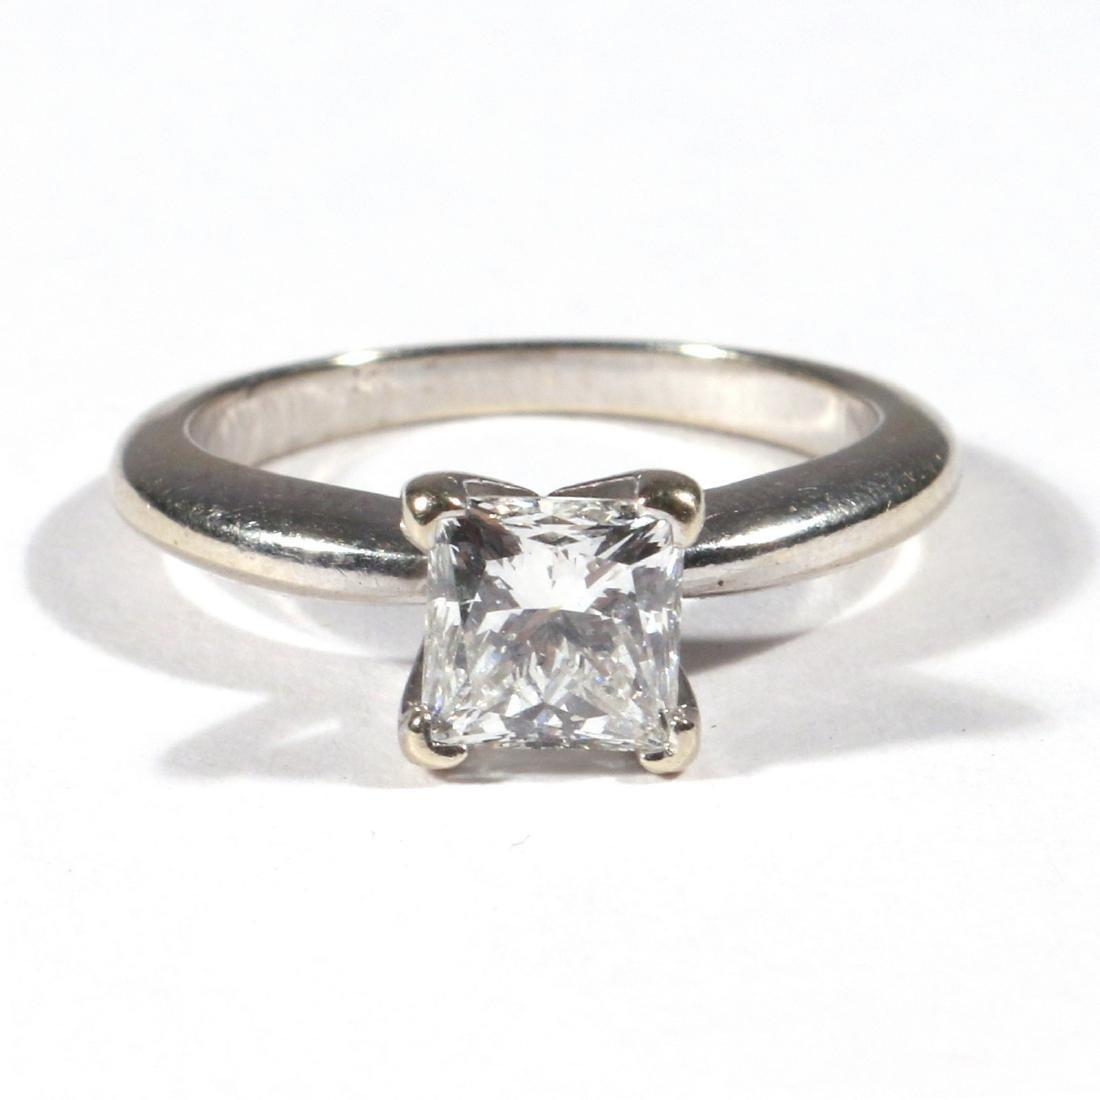 .91ct PRINCESS CUT DIAMOND ENGAGEMENT RING